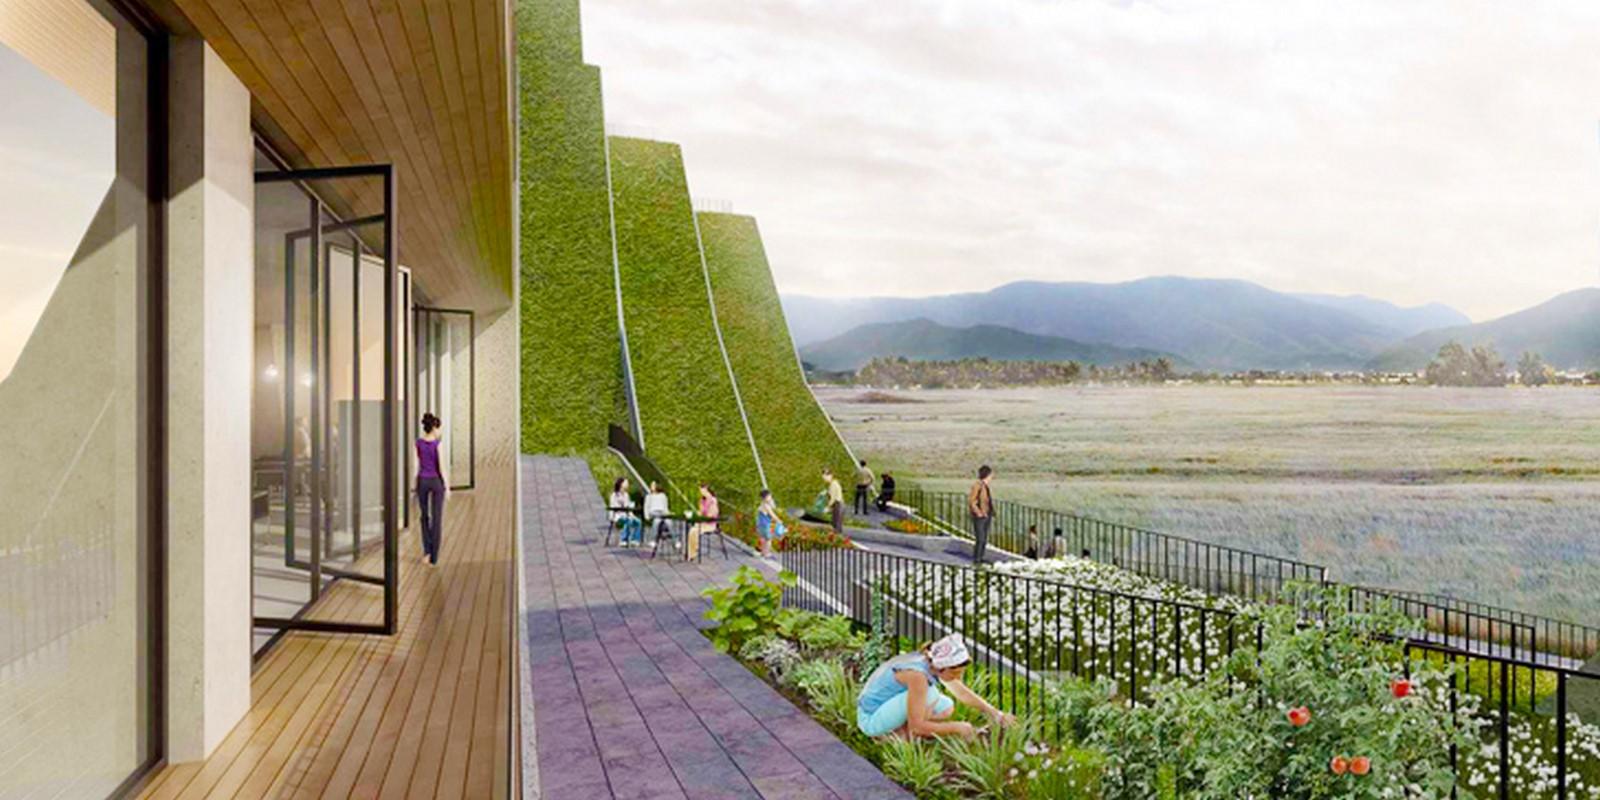 Hualien Residences by BIG: A Mountain-Shaped Resort - Sheet27